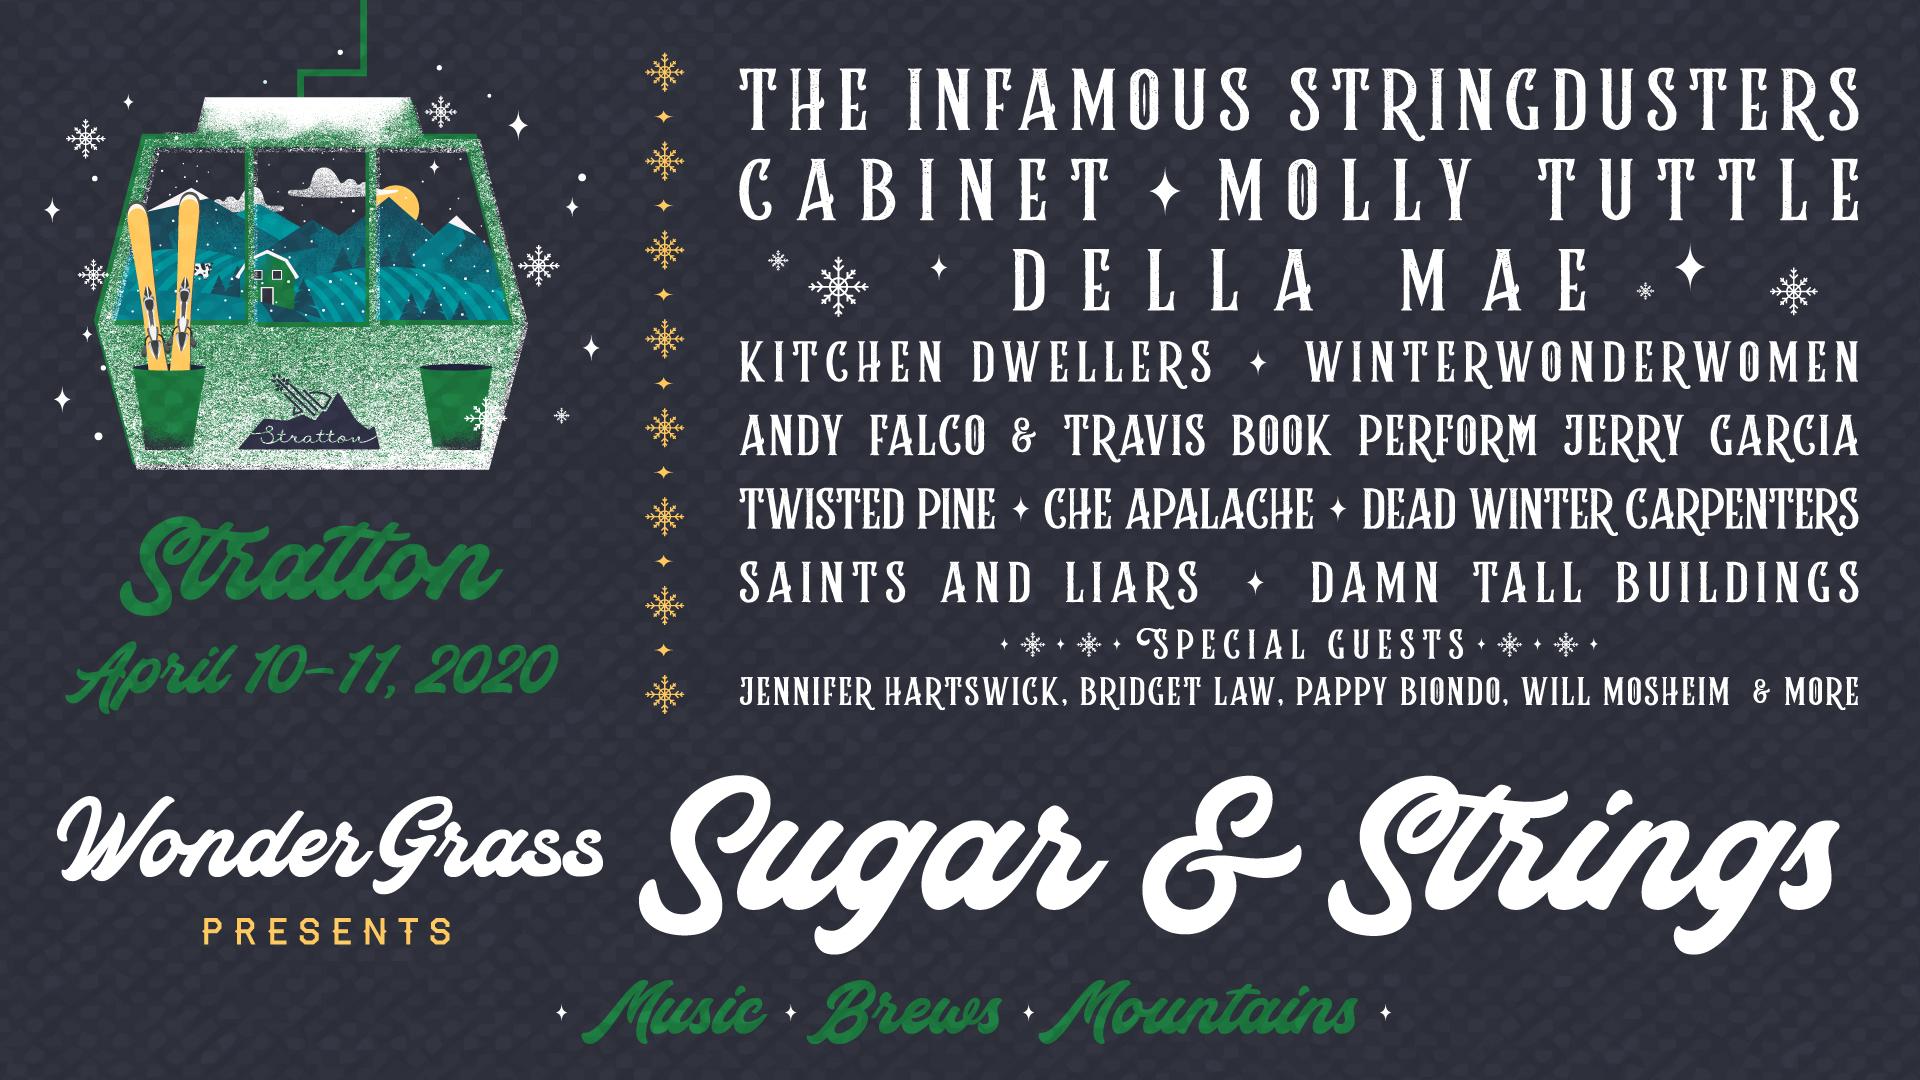 GIVEAWAY: Win tickets to WinterWonderGrass Sugar & Strings (Stratton, VT) Apr 10-11